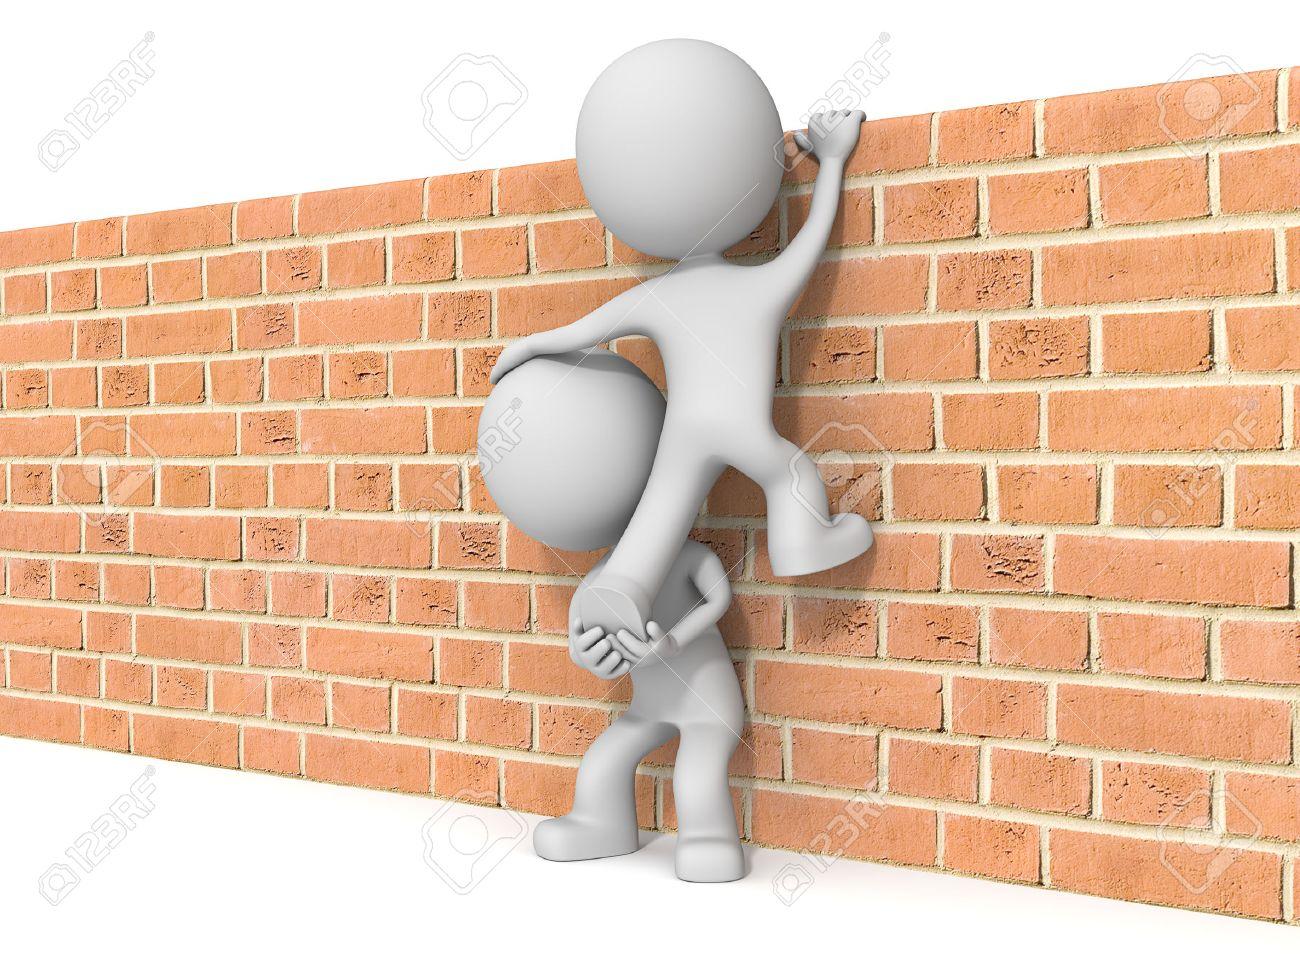 Over the wall. The dude 3D character x2 climbing Brick wall. Standard-Bild - 35600889